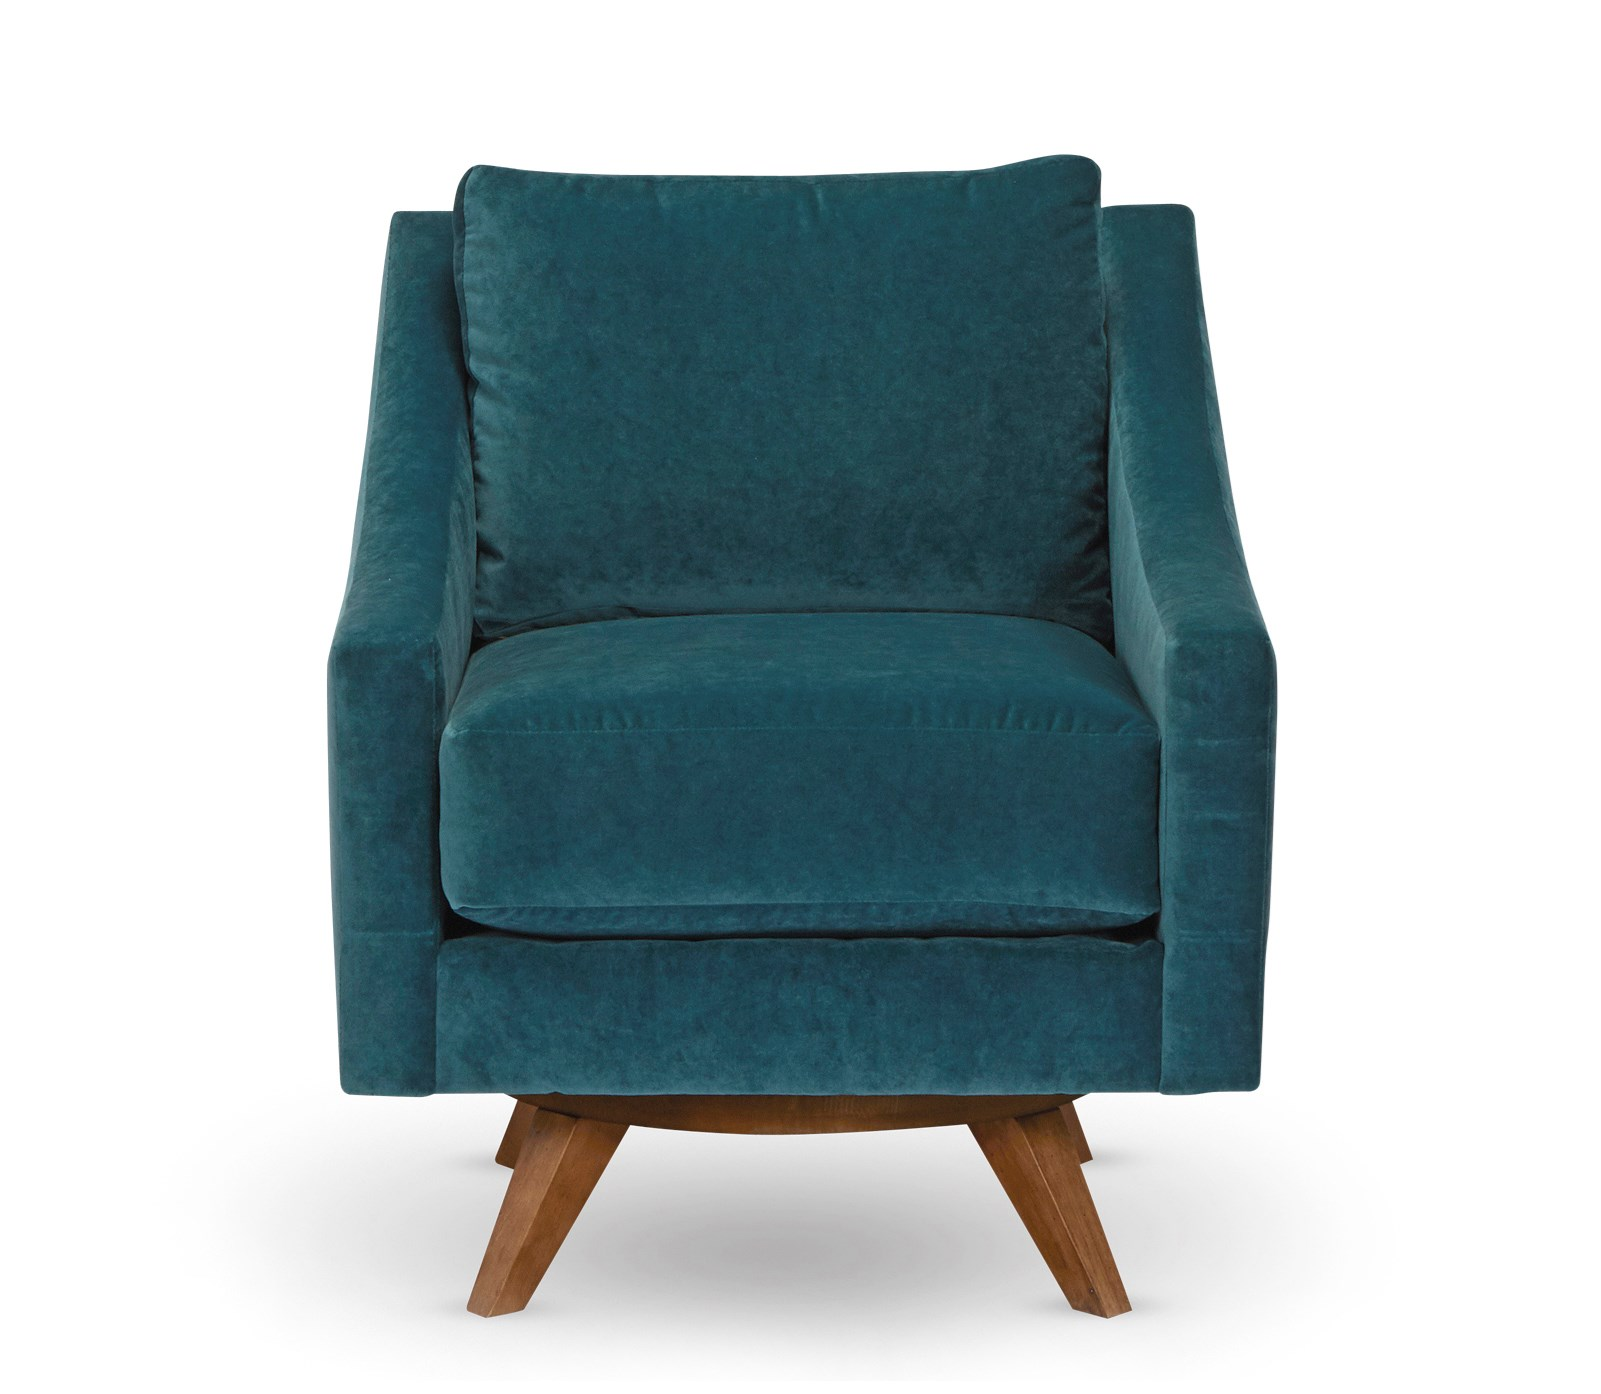 Kya Chair Chairs Chaises Living Room Robb Stucky